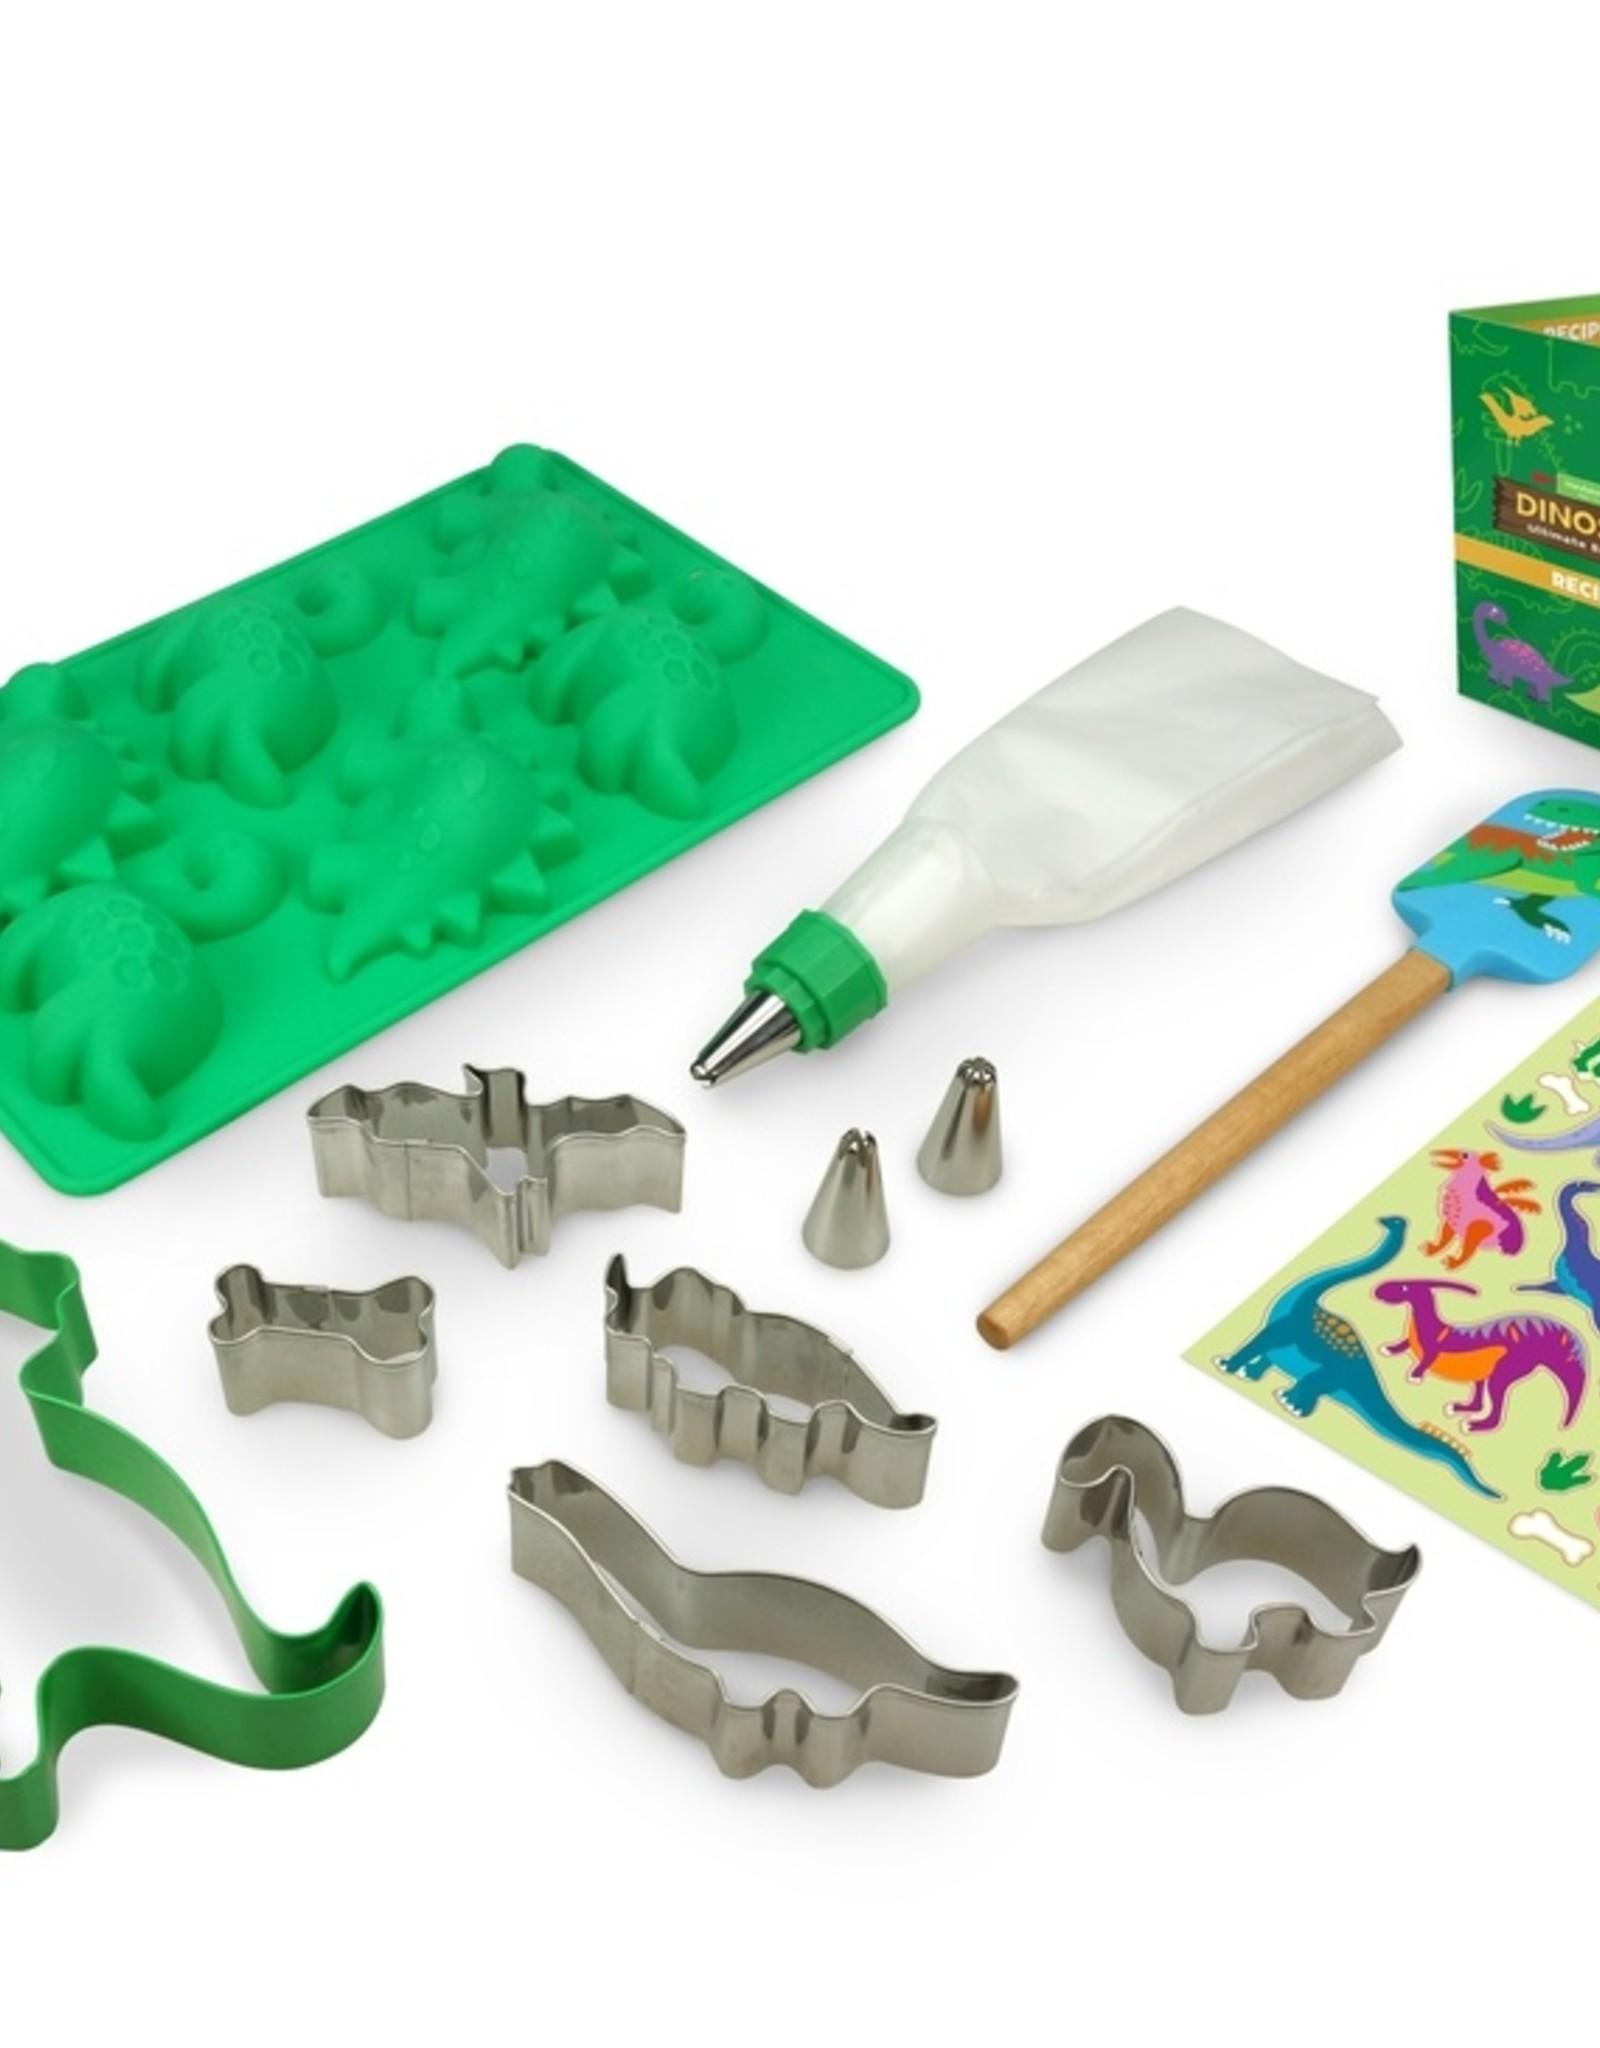 Handstand Kitchen Dinosaur Ultimate Baking Party Set